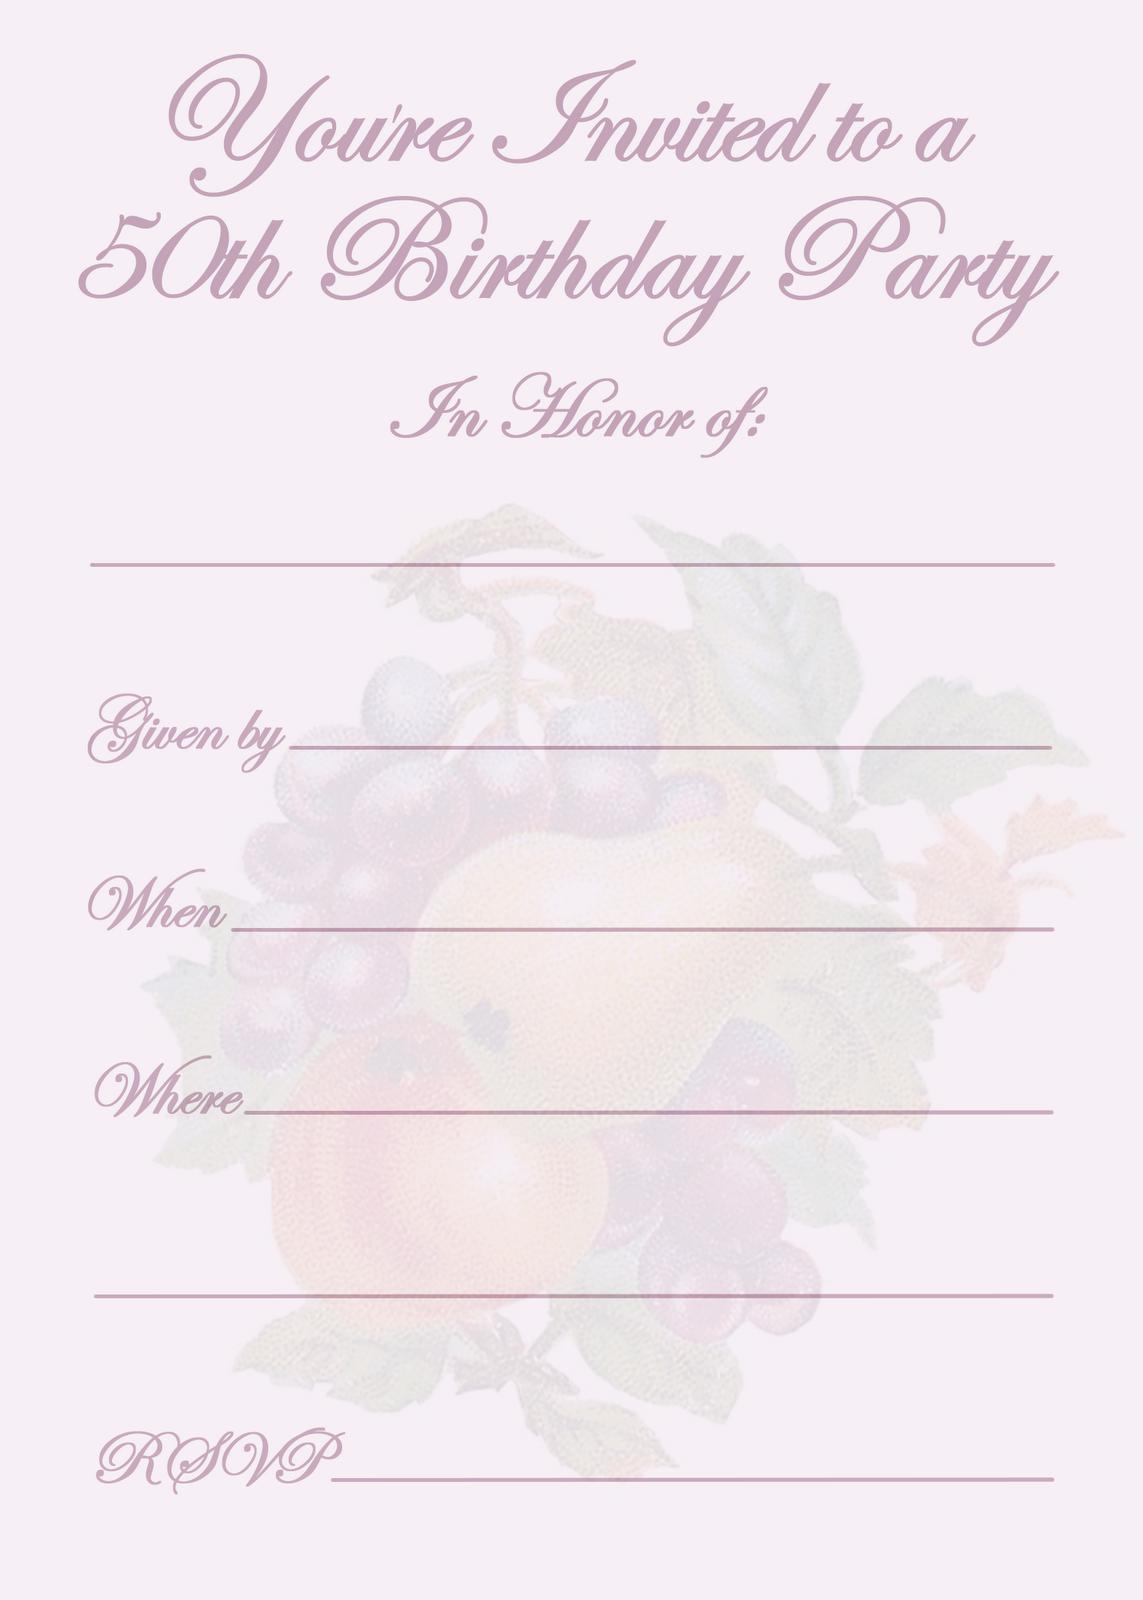 Online Printable 50th Birthday Invitations